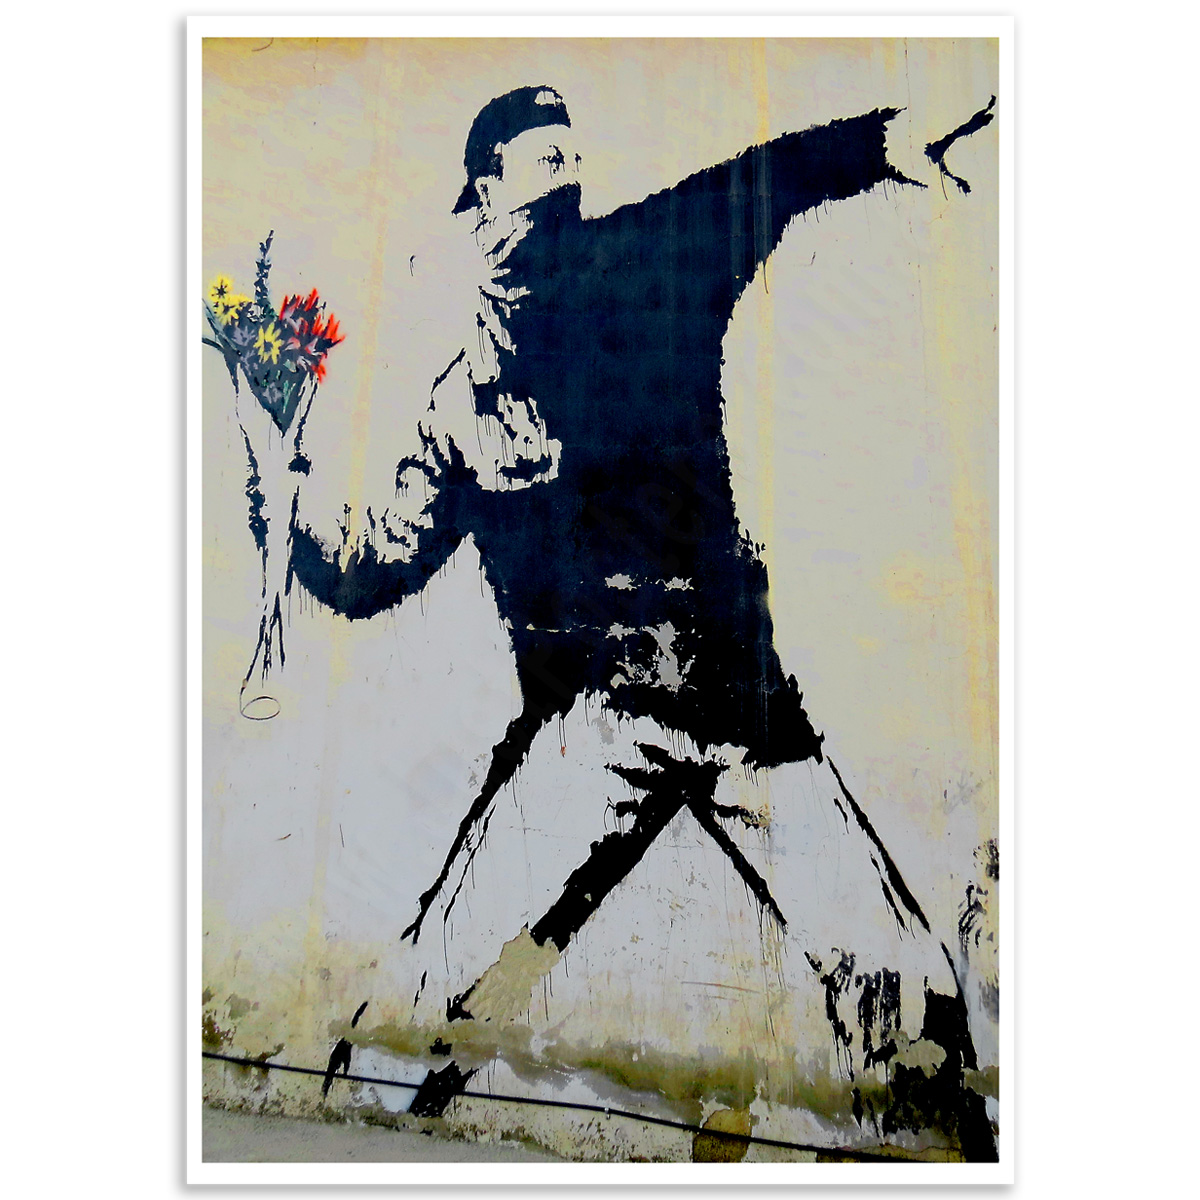 Street Art Poster - Flower Thrower